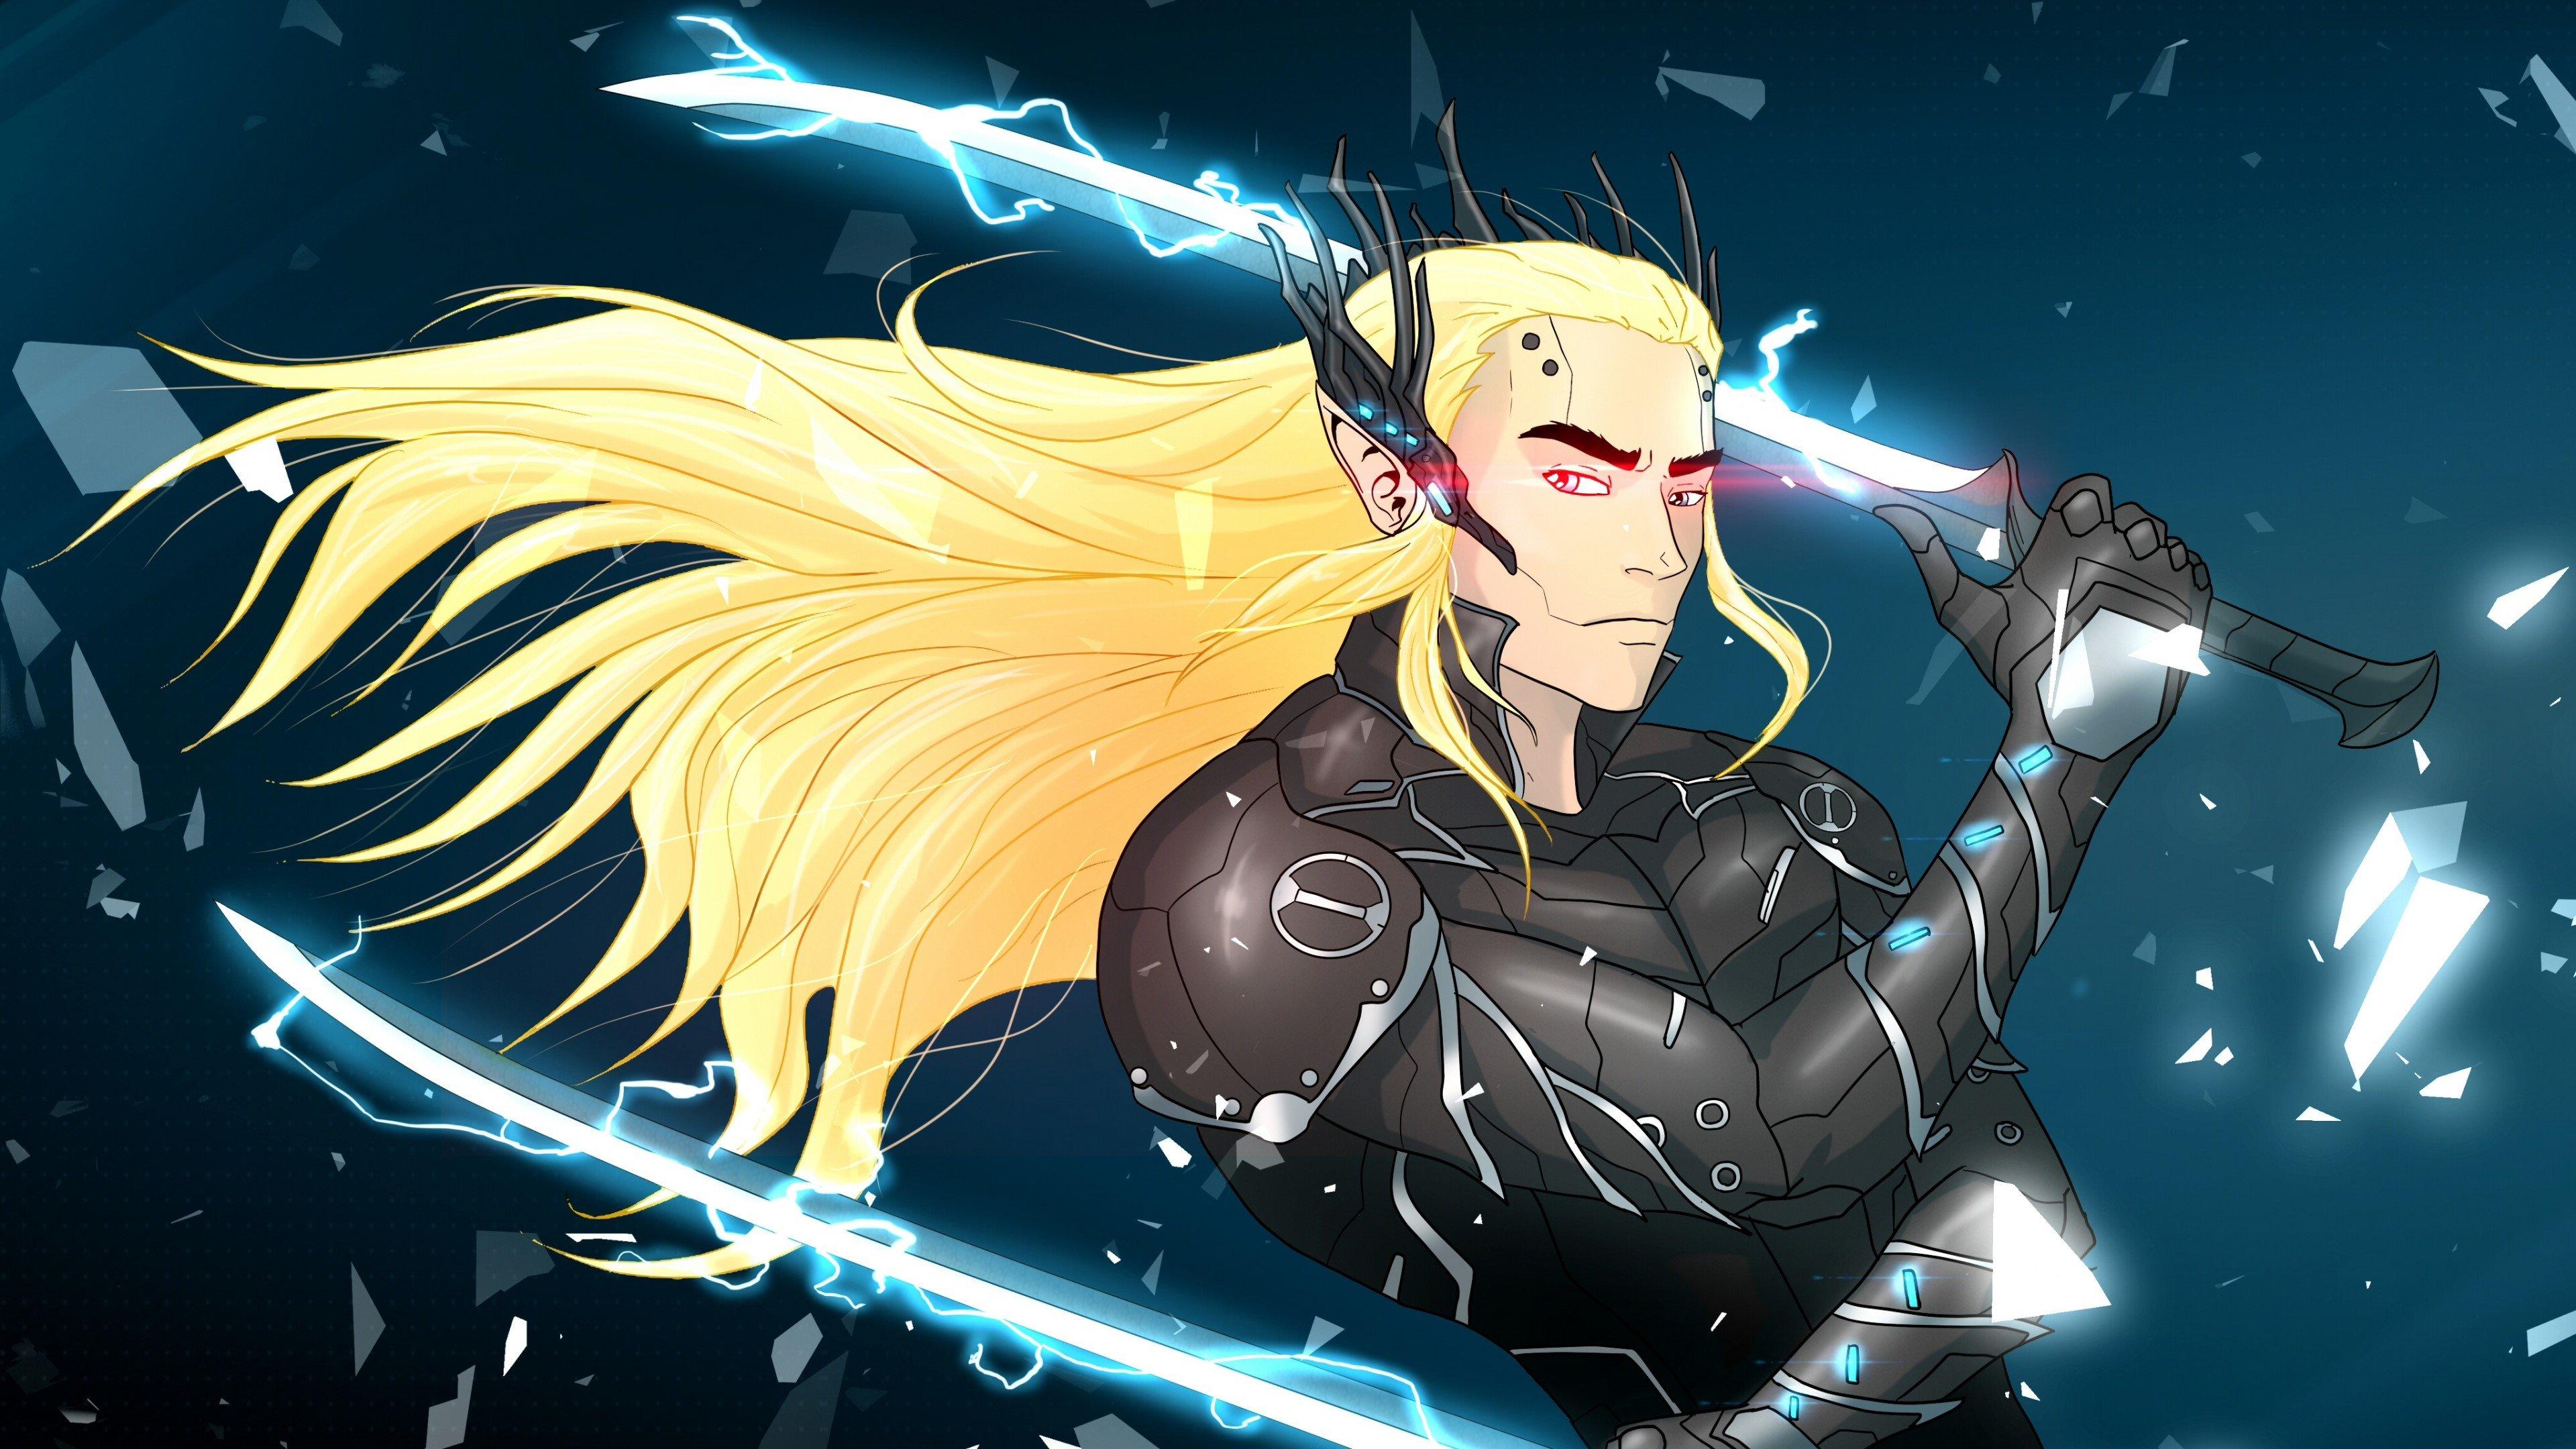 Fondos de pantalla Thranduil como dibujo de Metal Gear Rising Revengeance